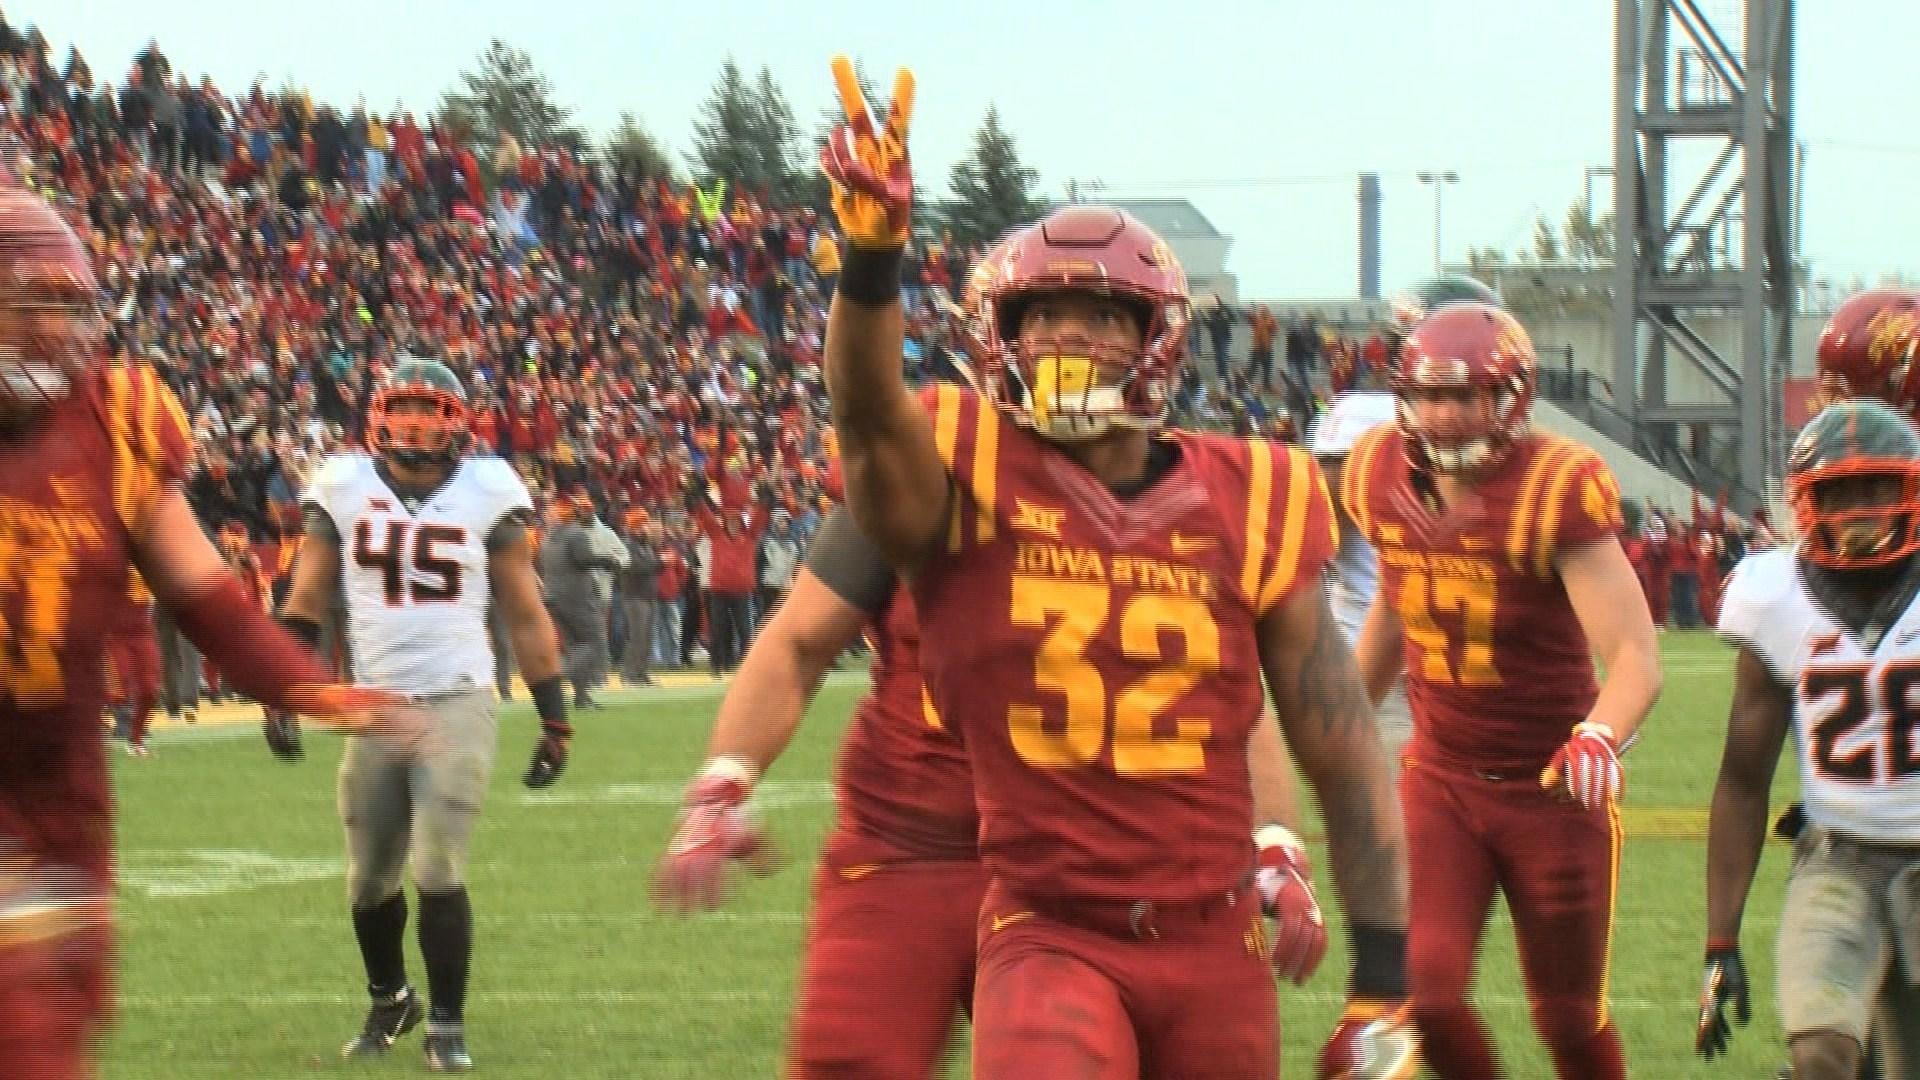 David Montgomery has 11 rushing touchdowns for Iowa State this season.